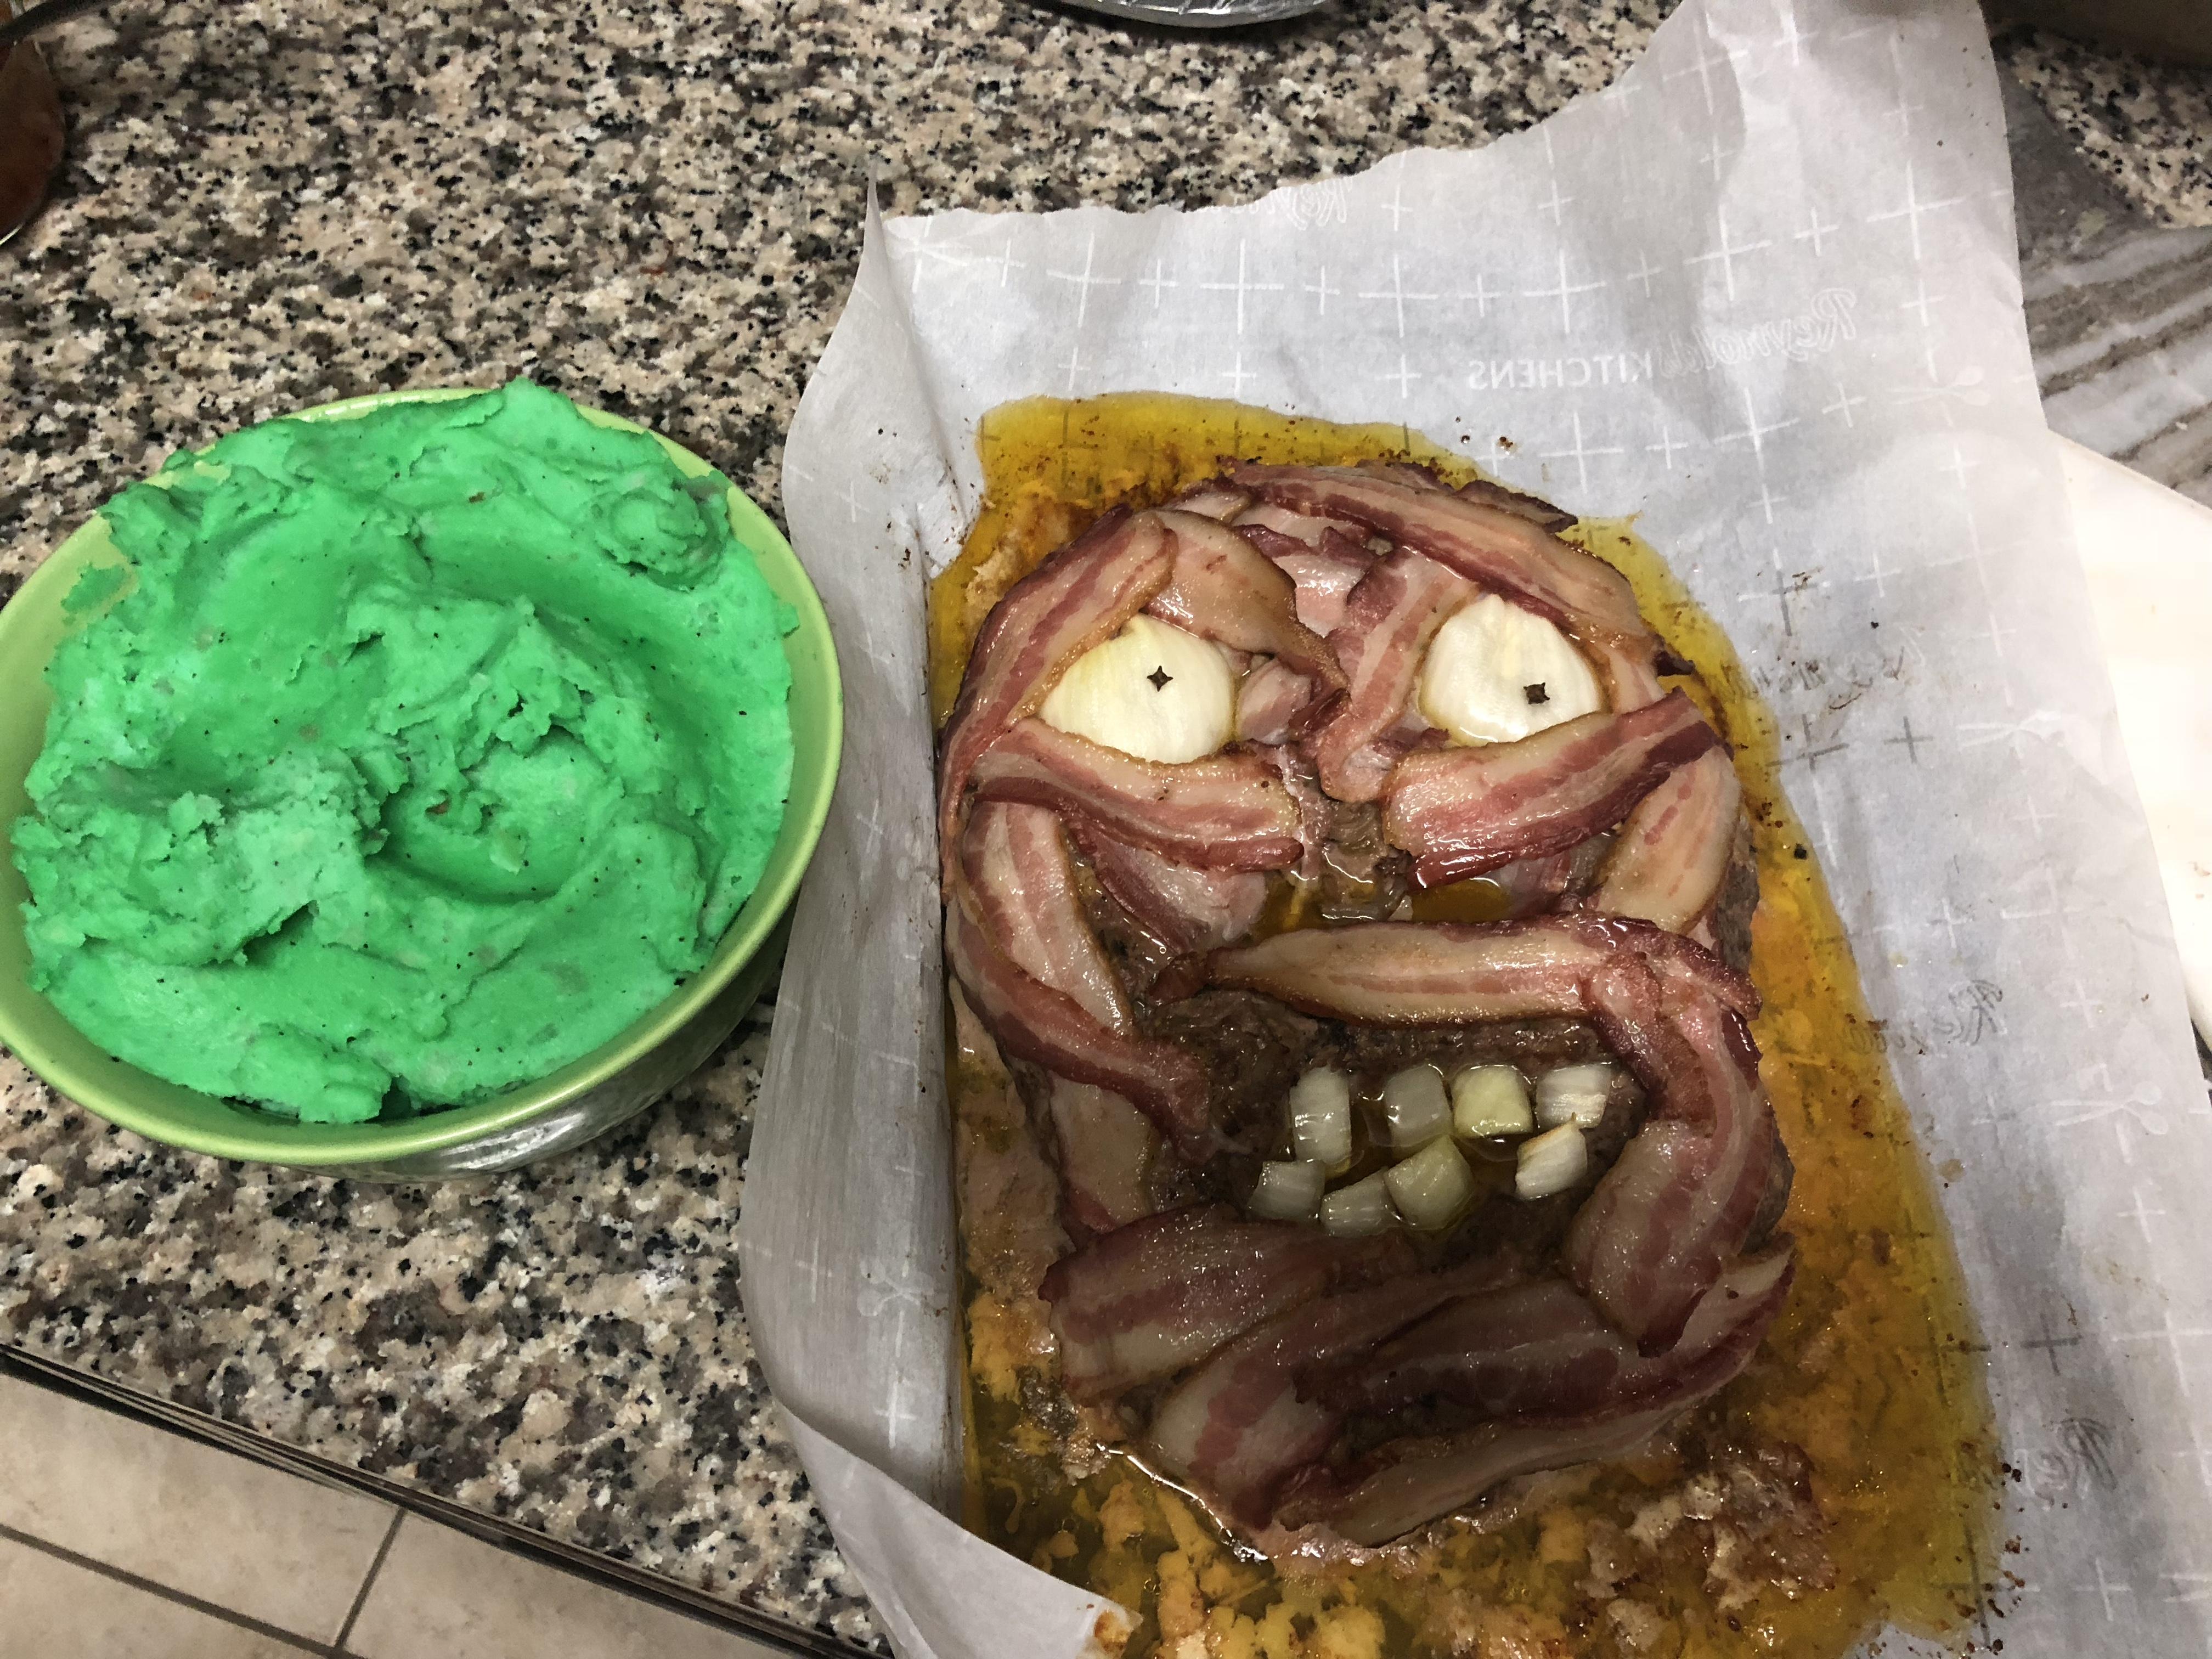 Chef John's Zombie Meatloaf Sarah Stewart